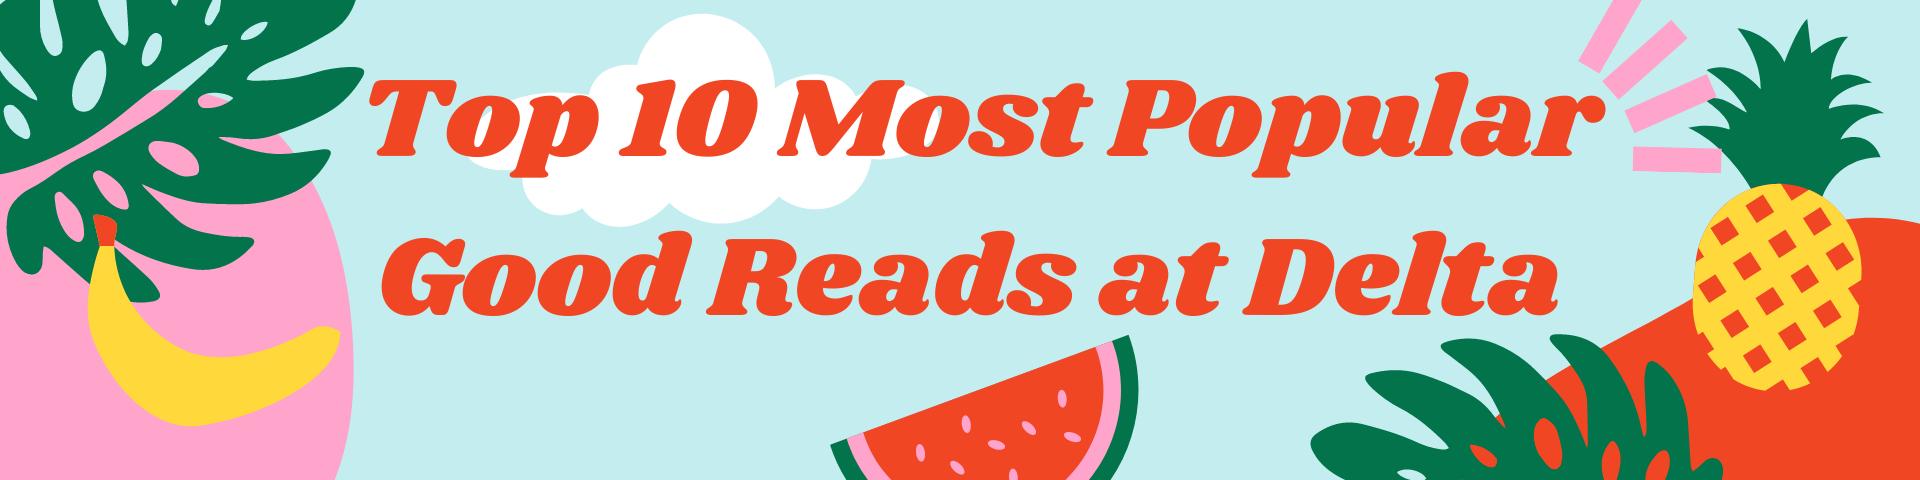 Top 10 Most Popular Good Reads at Delta